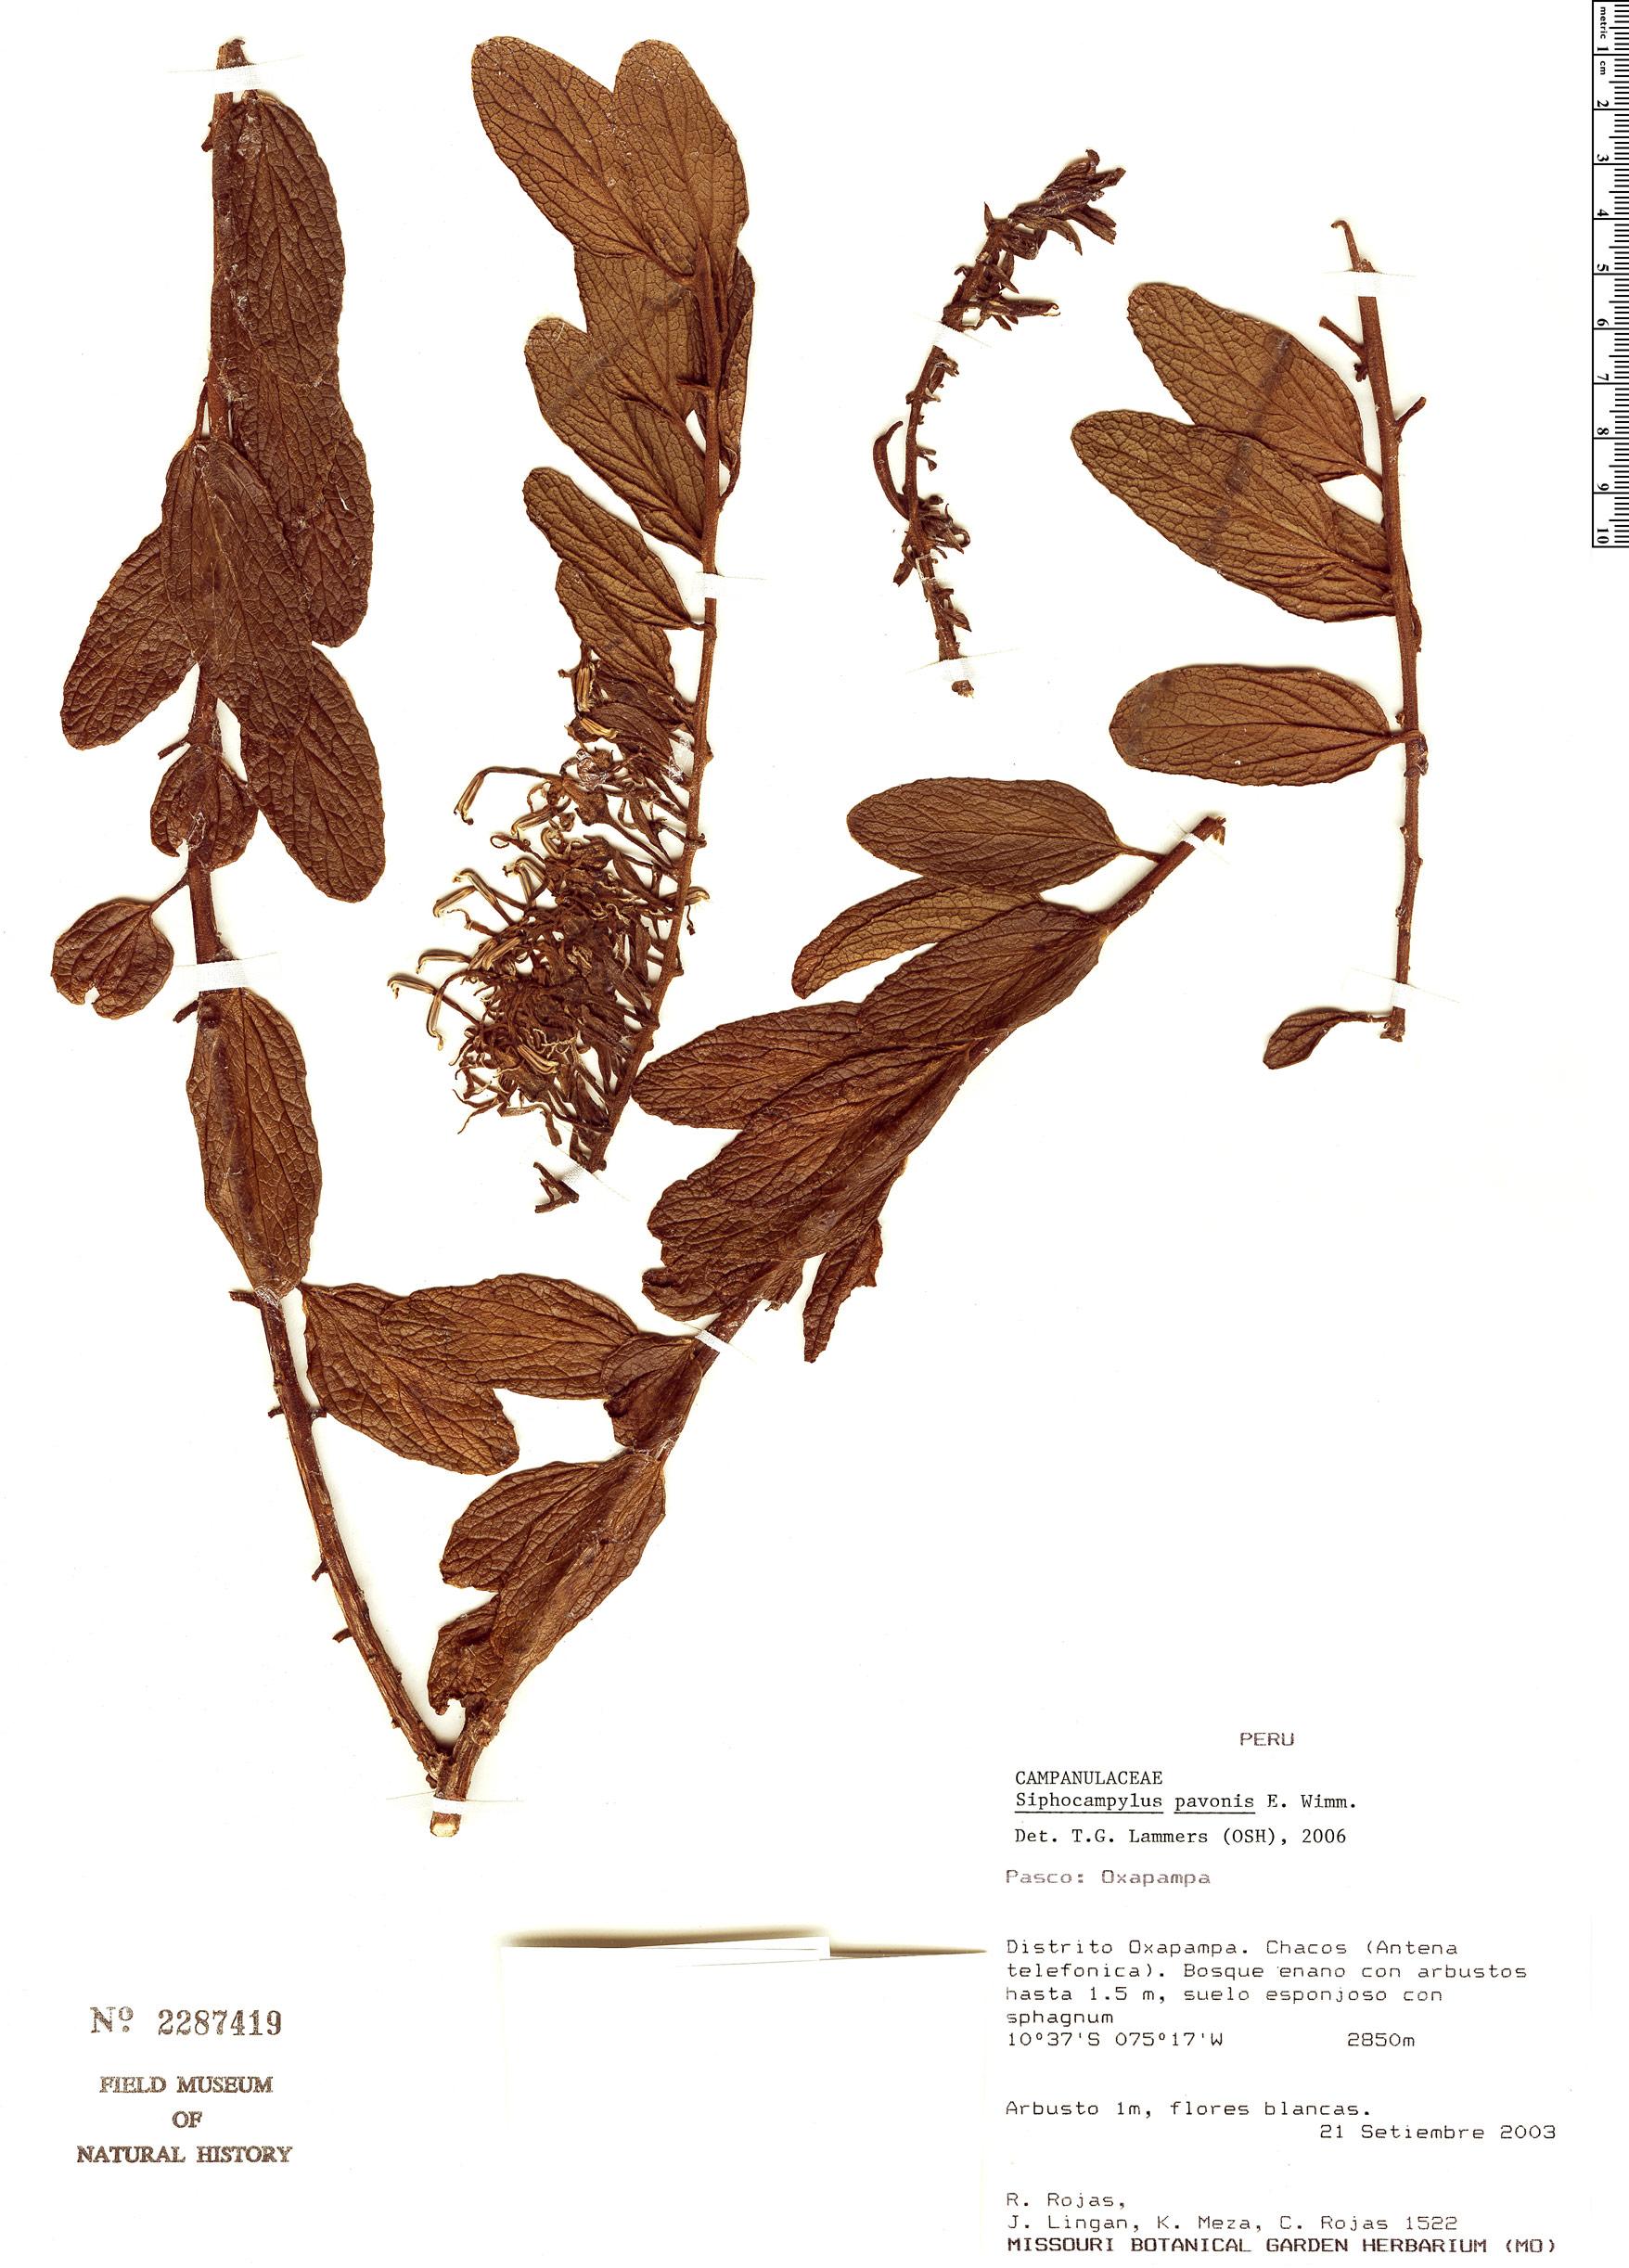 Specimen: Siphocampylus pavonis